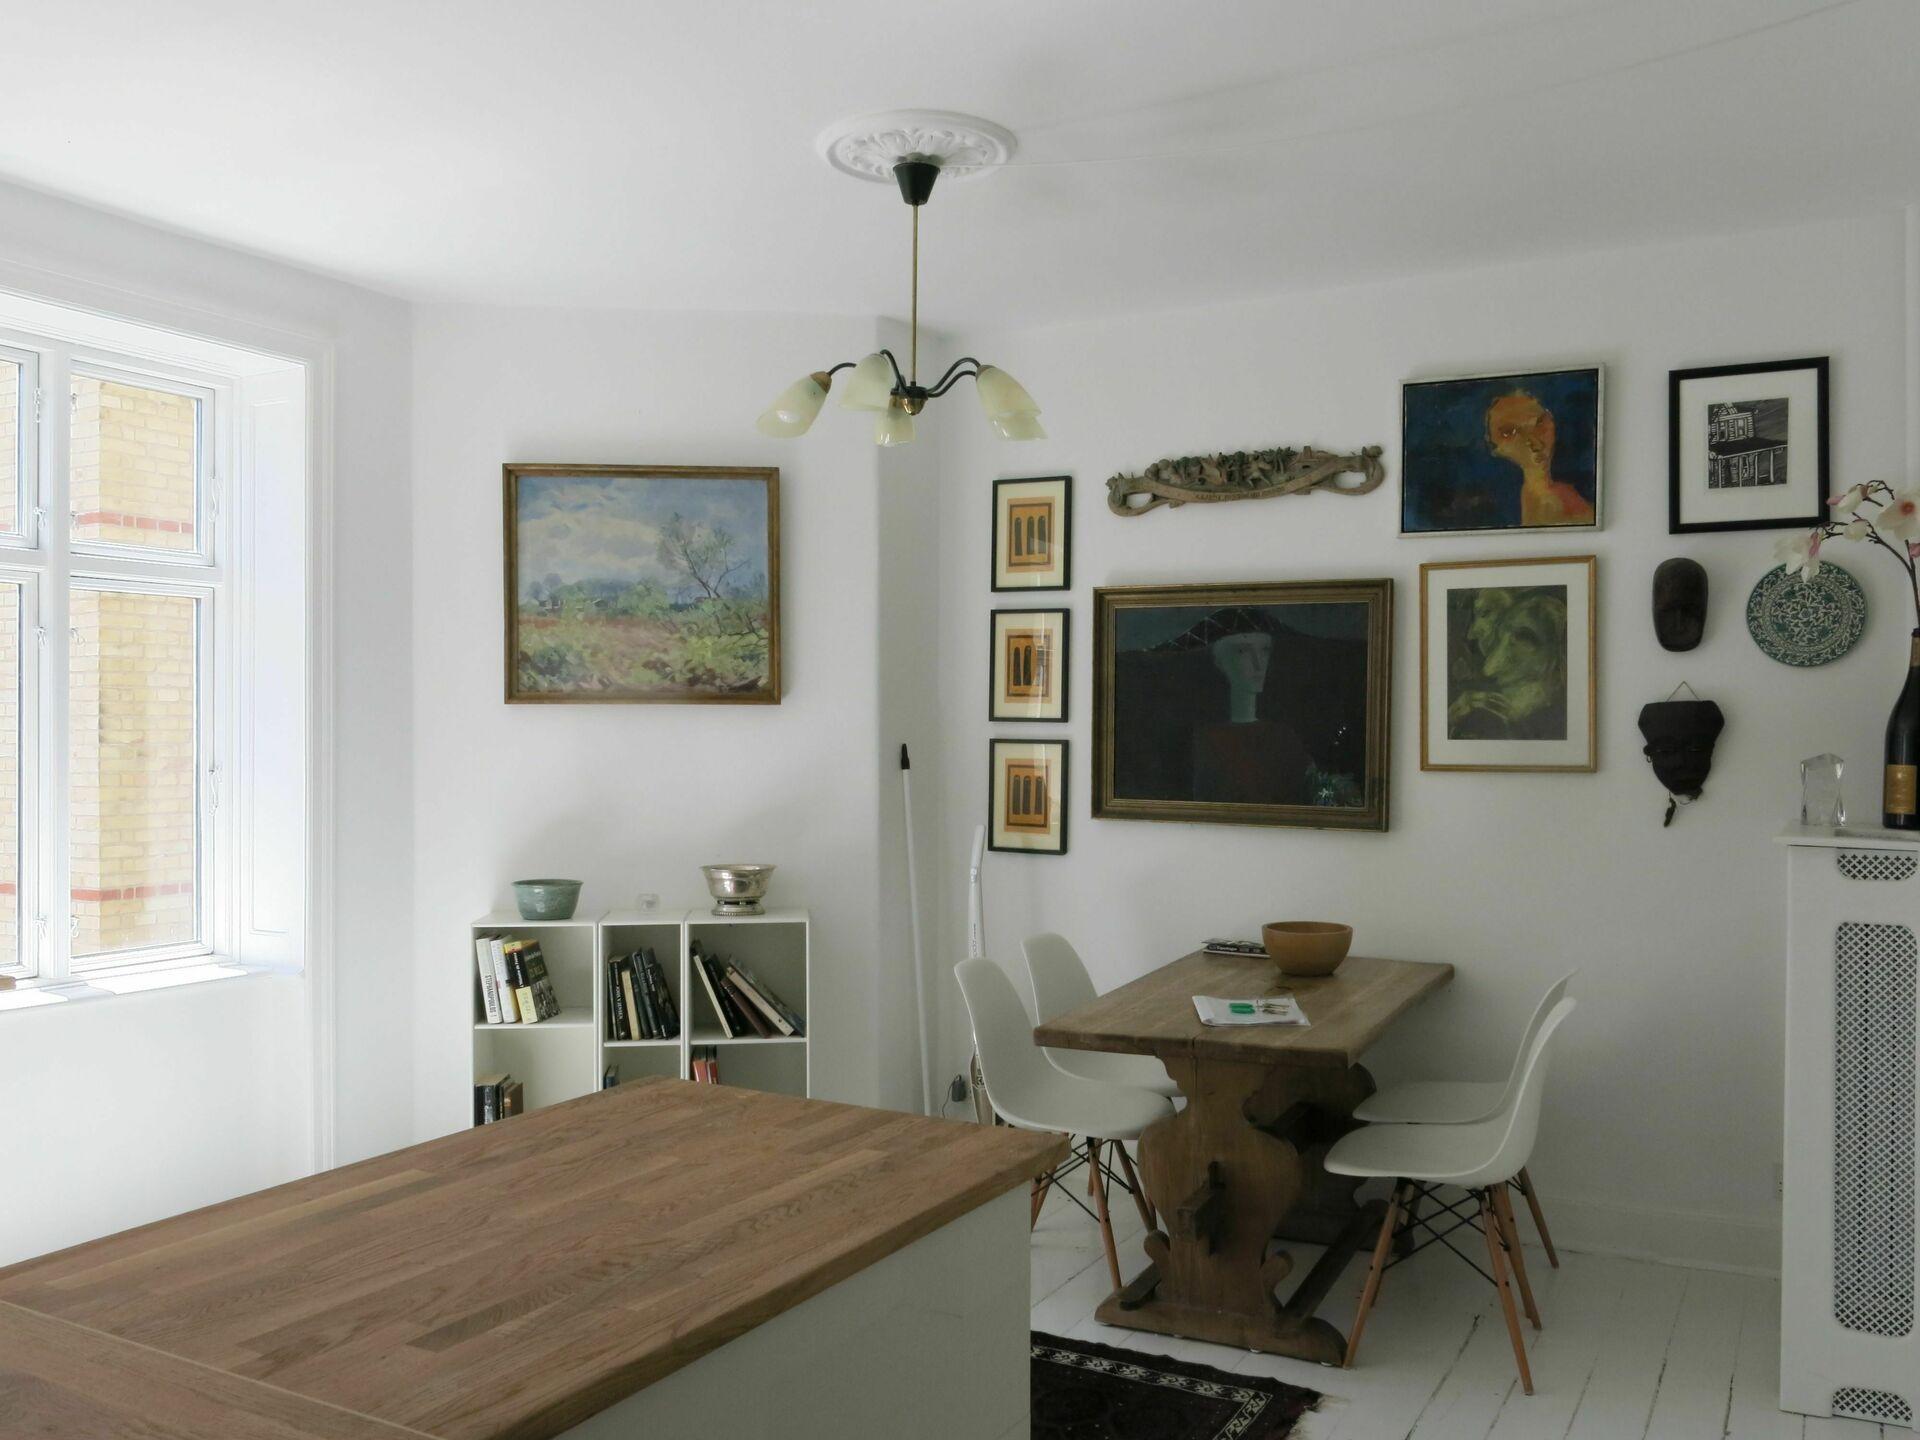 roarsvej 2 persons wohnung in kopenhagen. Black Bedroom Furniture Sets. Home Design Ideas